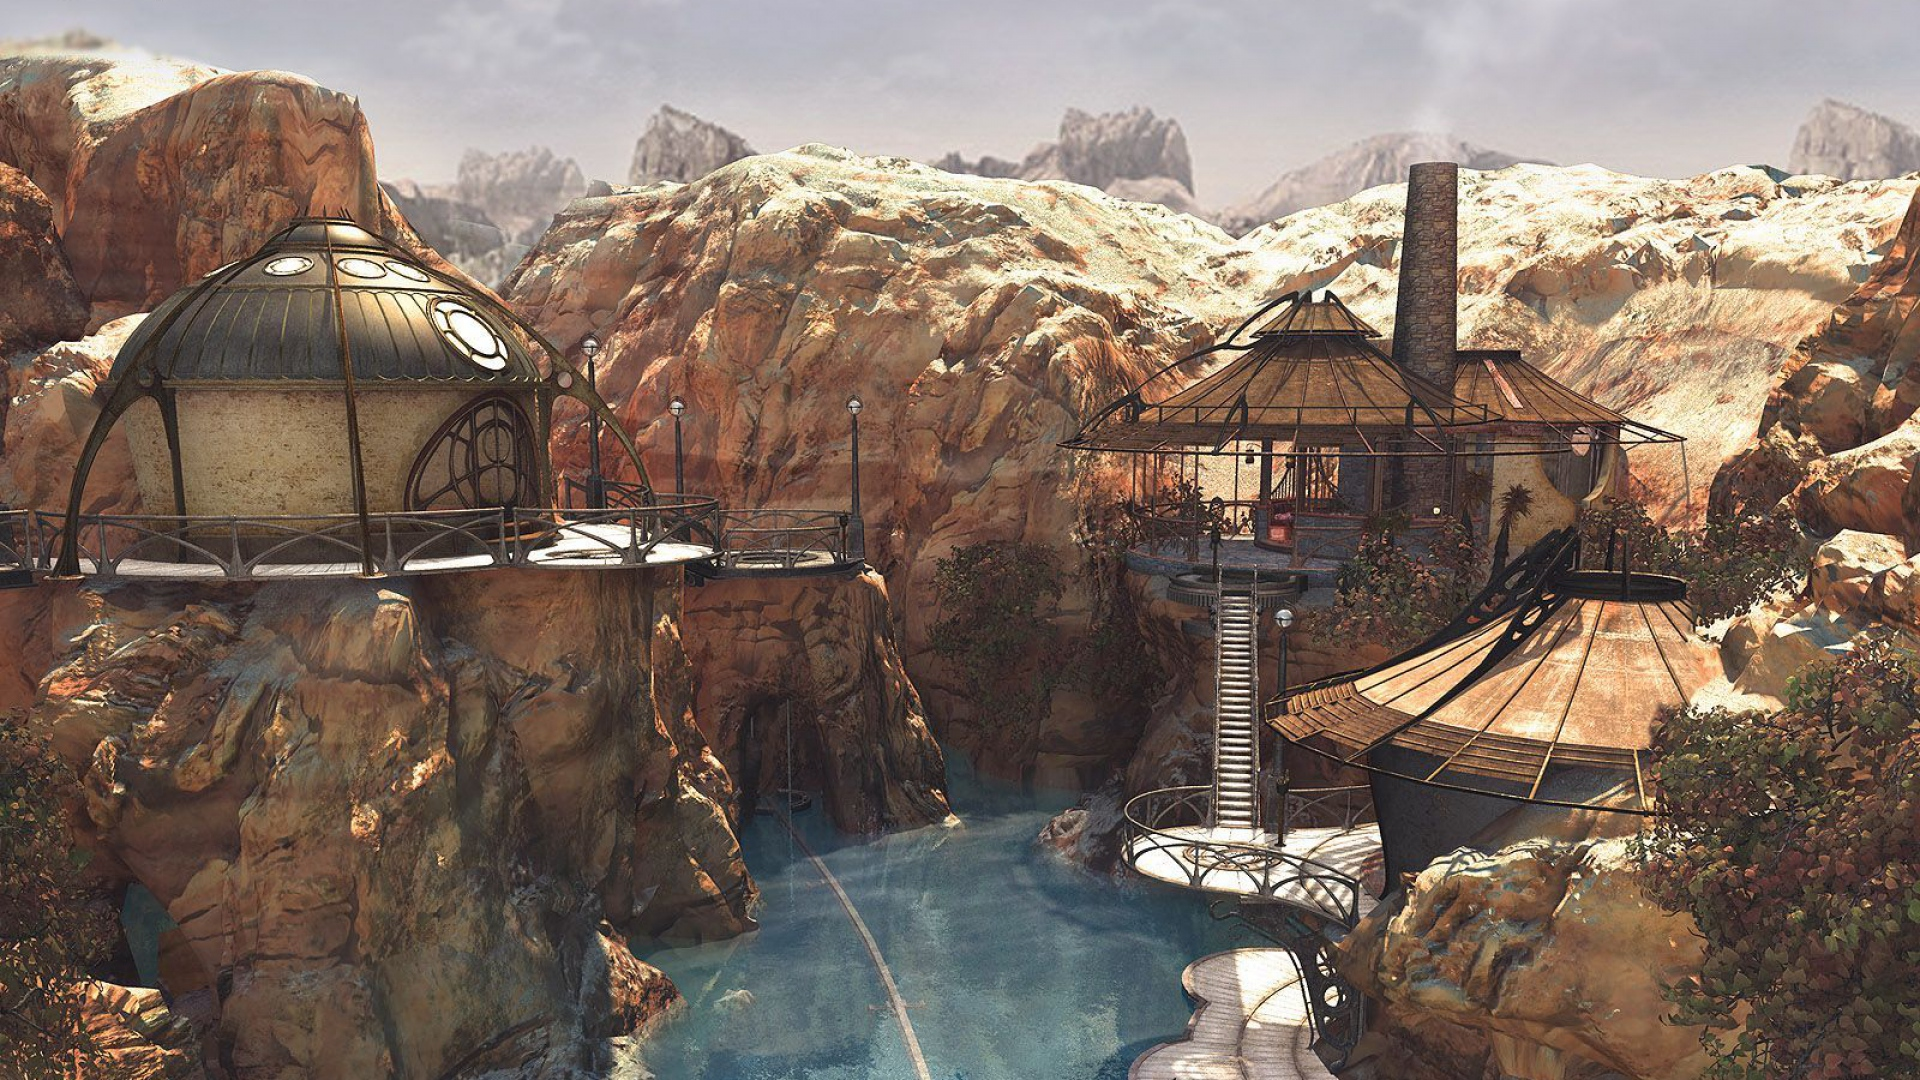 На Kickstarter появилась коллекция Myst 25th Anniversary Collection, включающая все игры серии